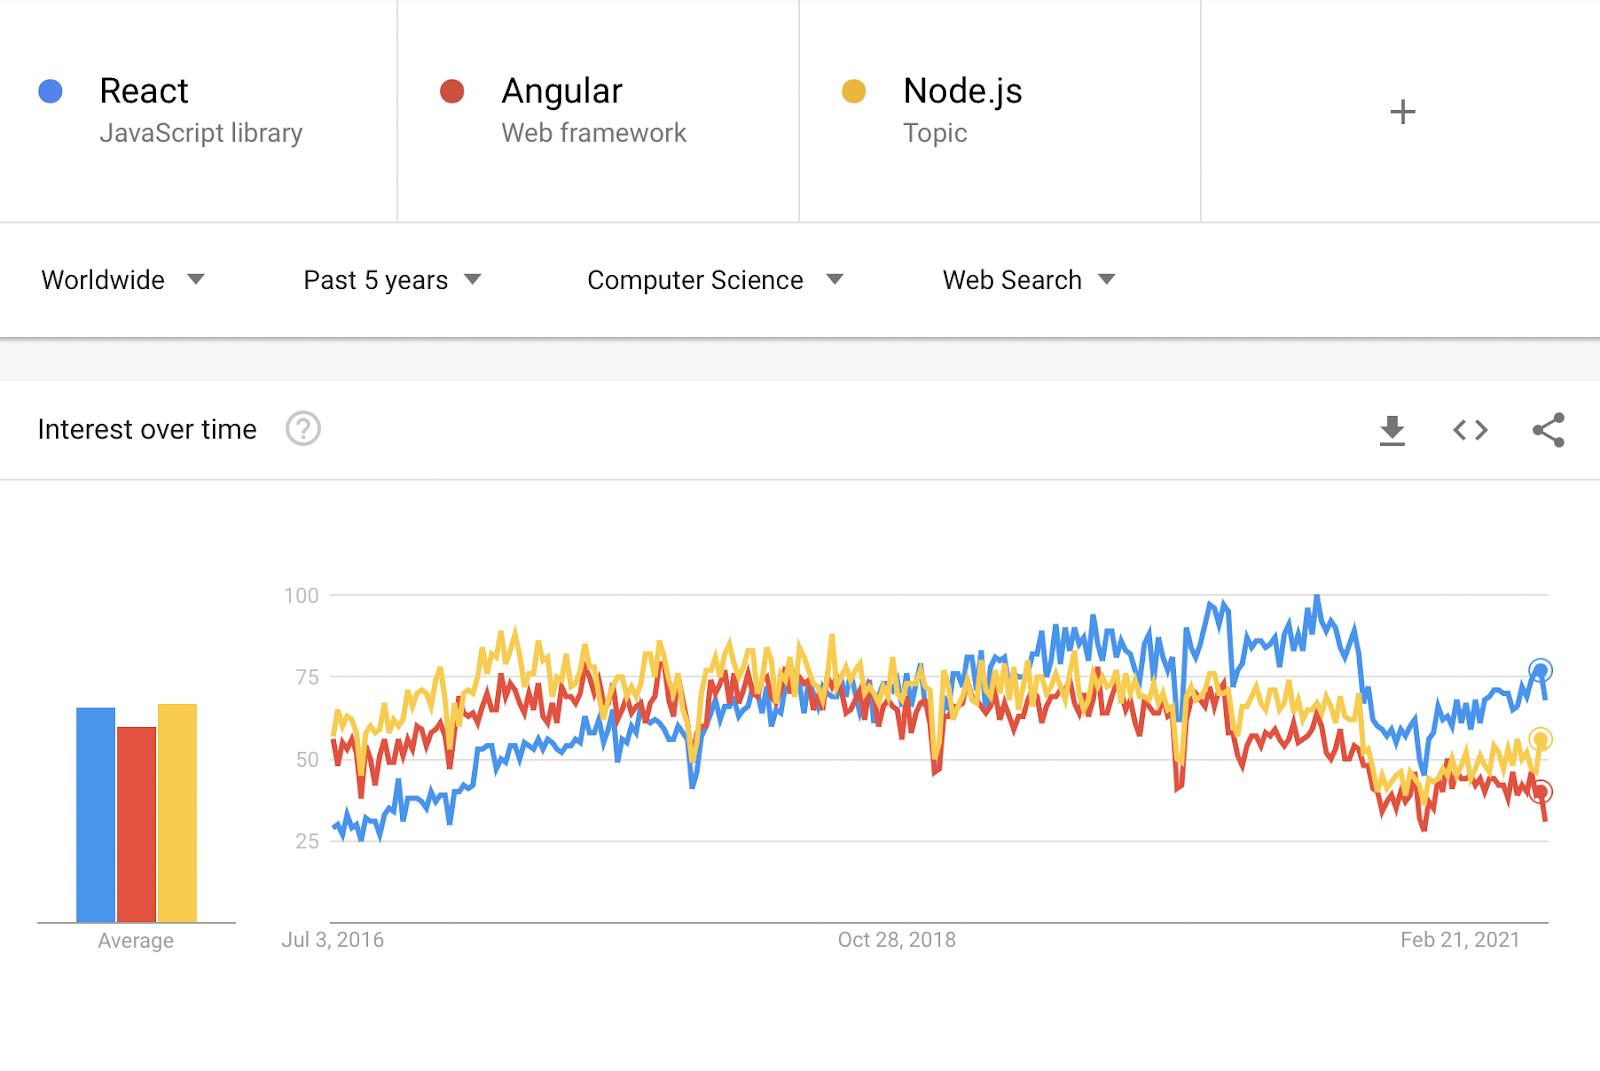 Google Trends Screenshot showing interest in React, Angular, Nodejs over time